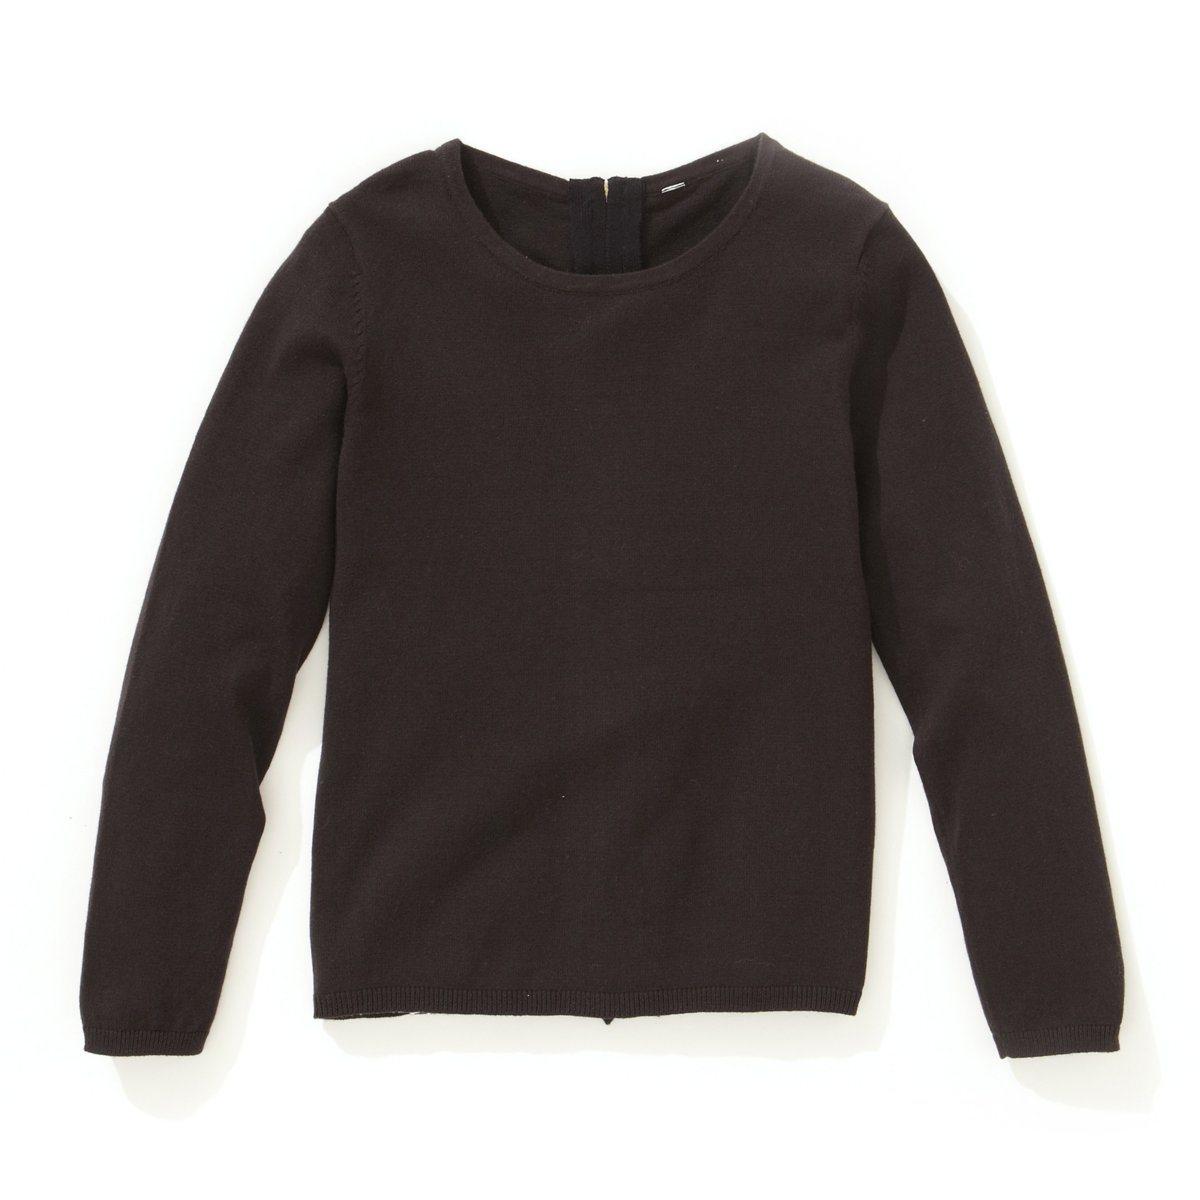 Пуловер от La Redoute